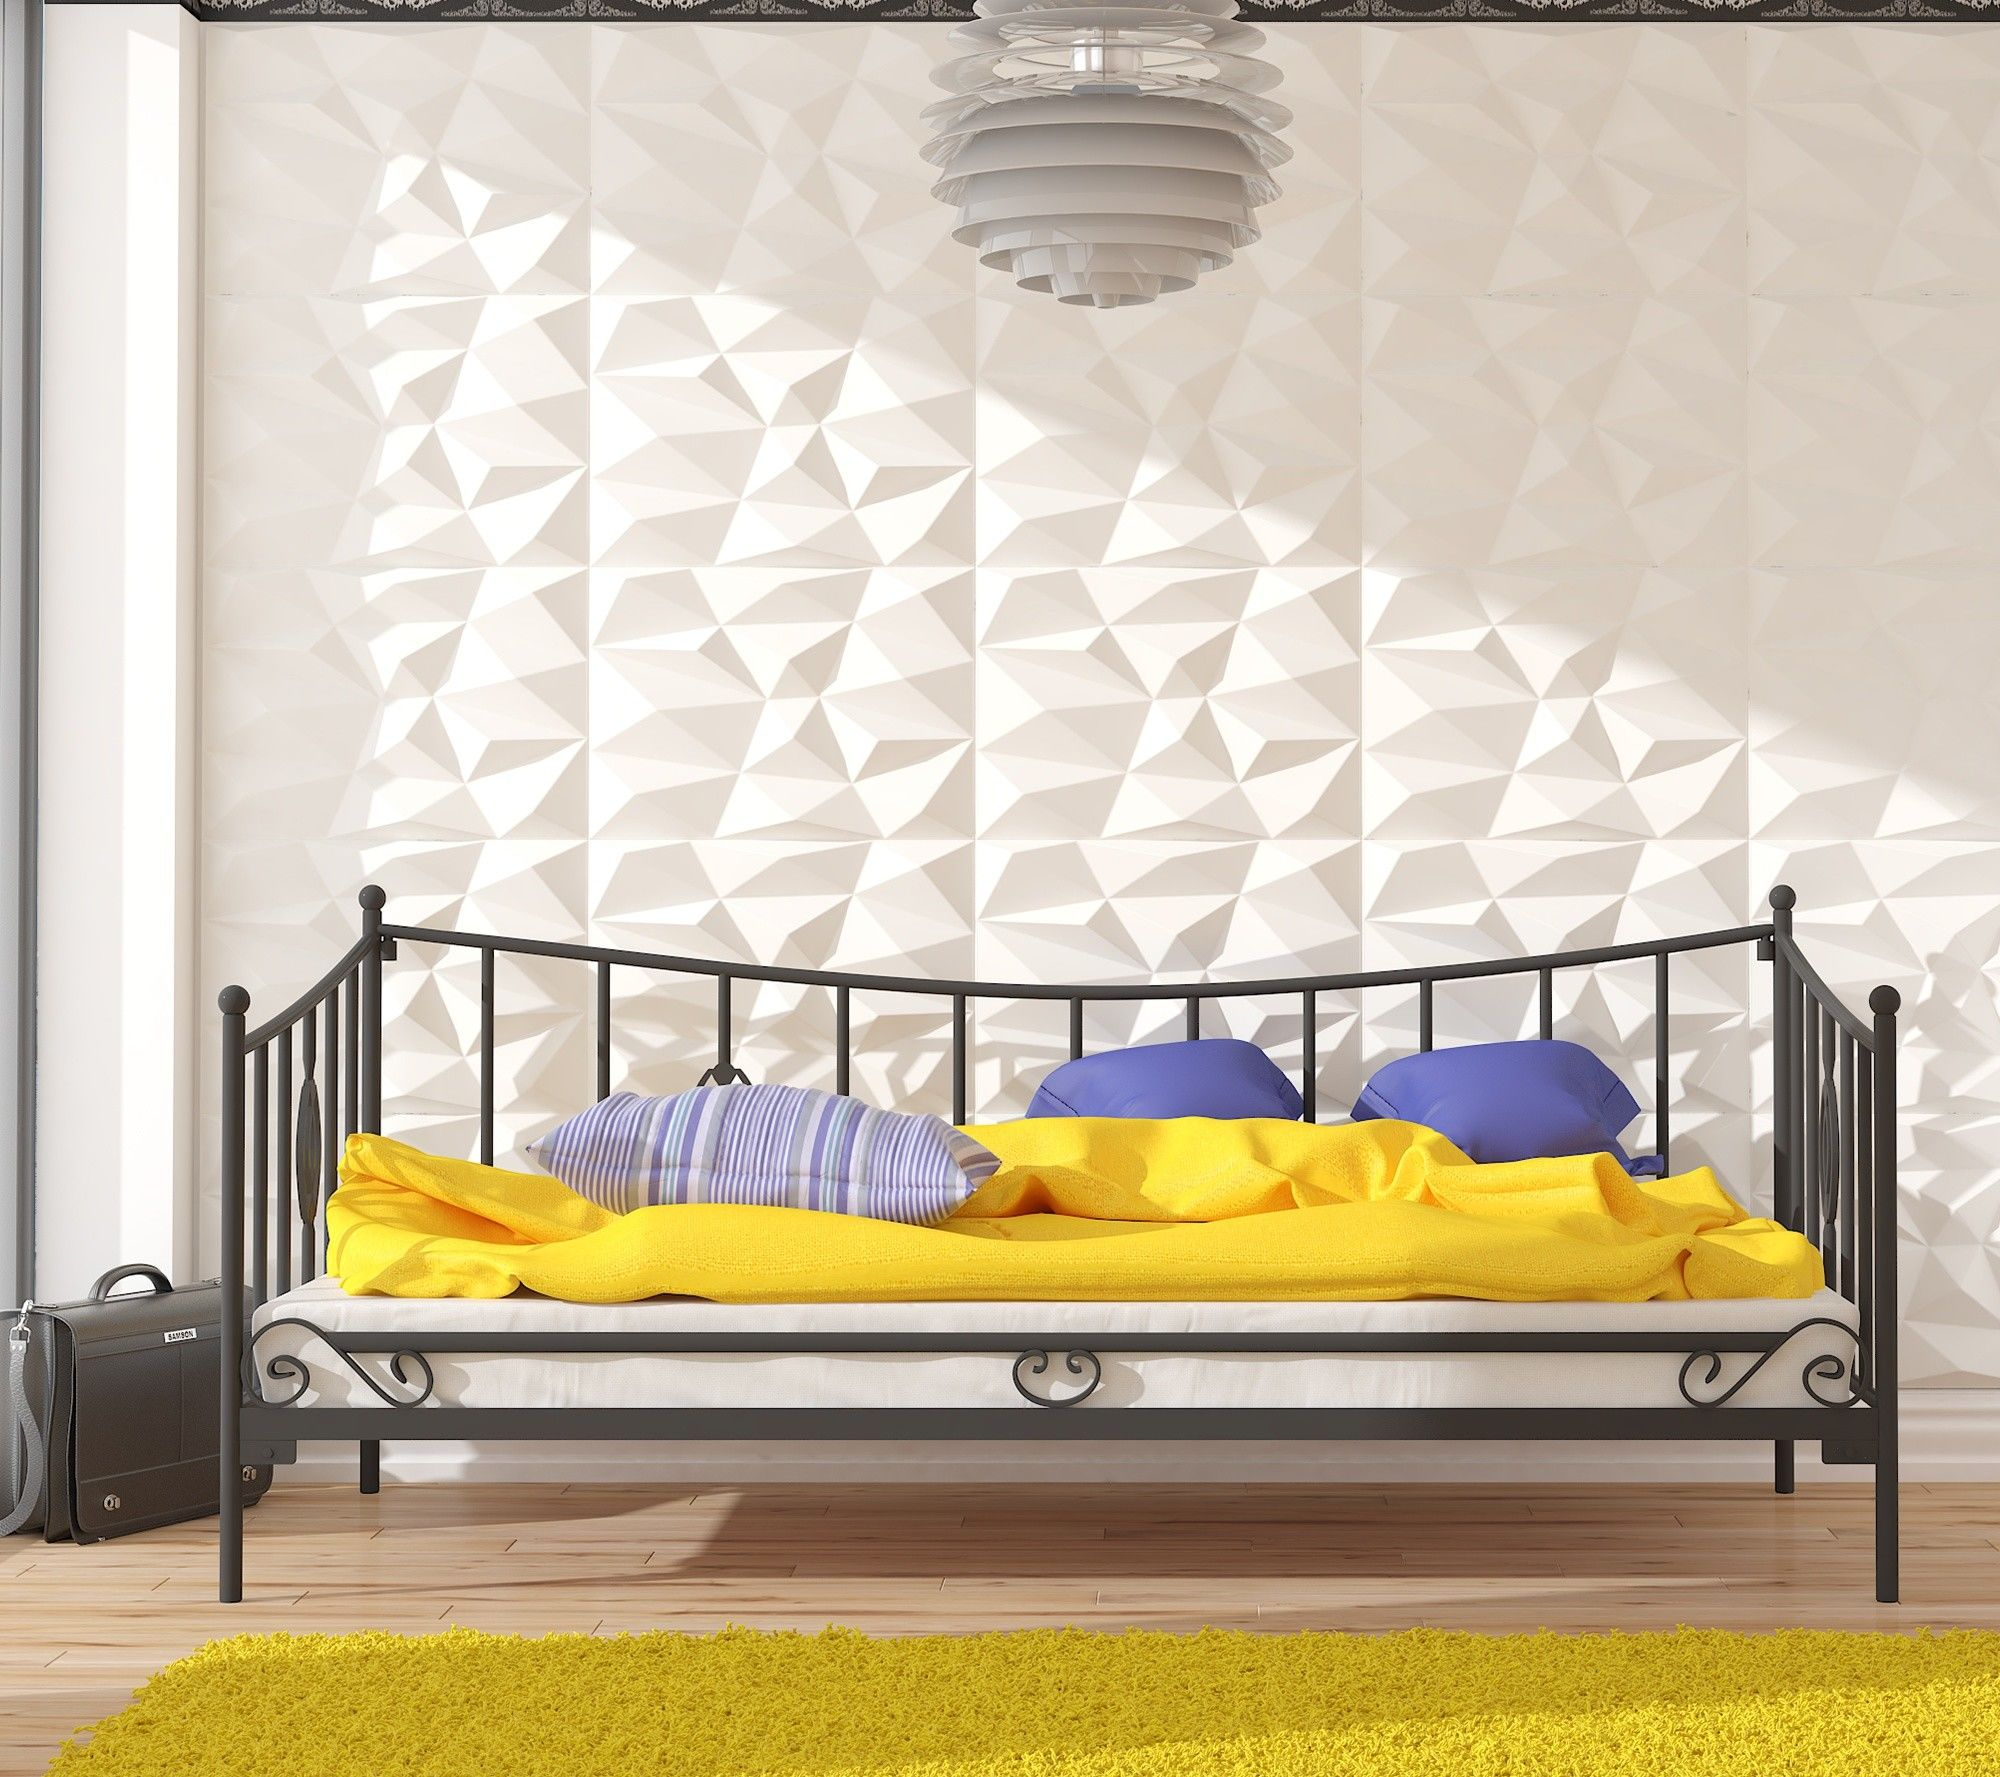 Łóżko metalowe sofa 90x180 wzór 31 ze stelażem